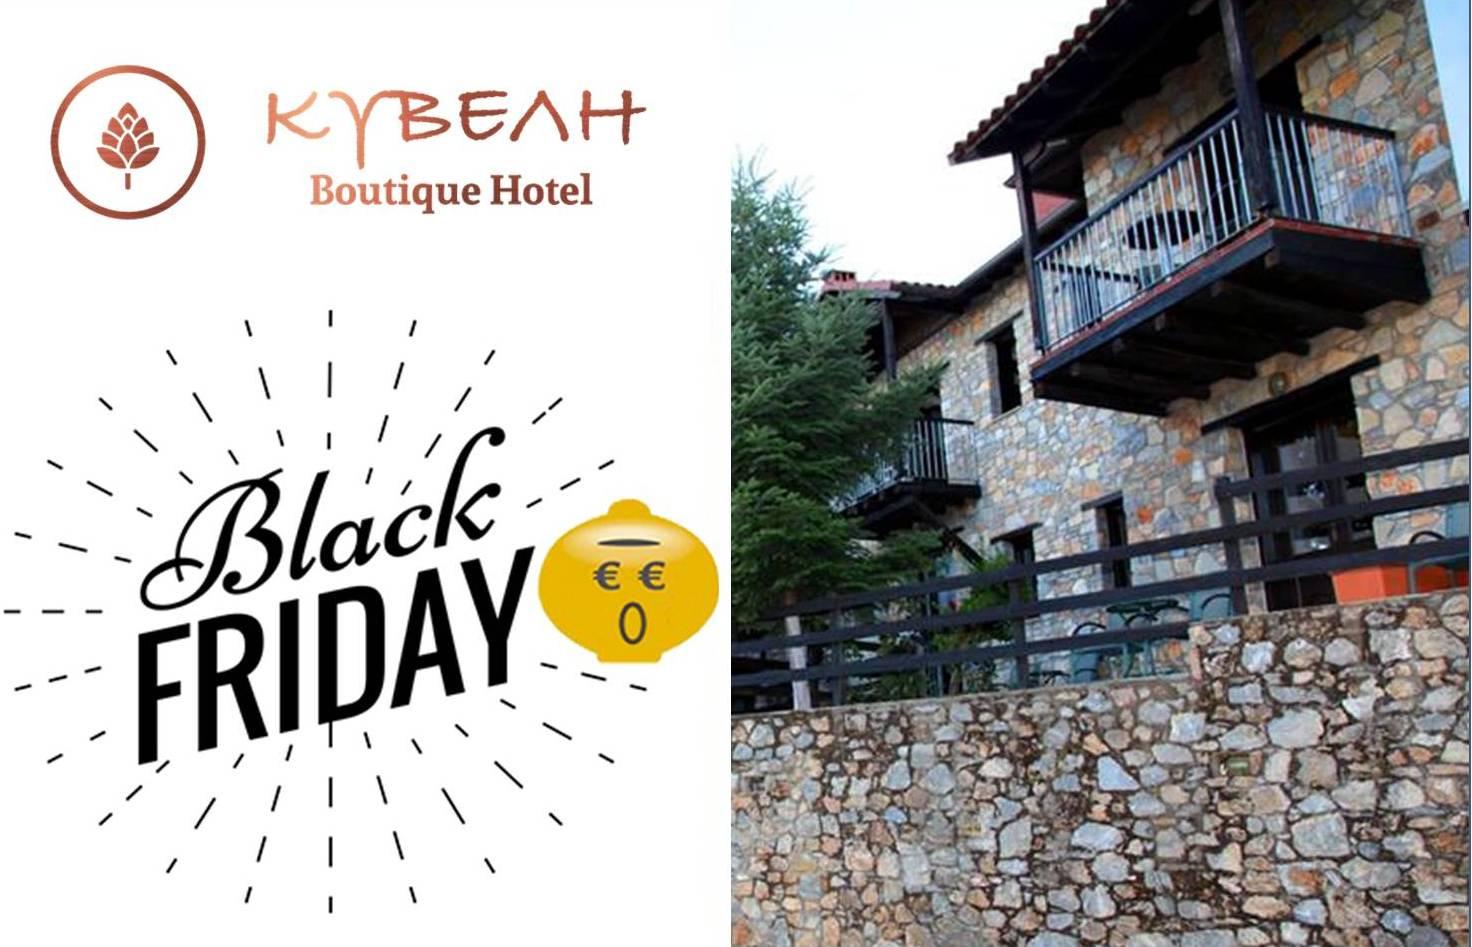 BLACK FRIDAY WEEK: Από 89€ για 3ήμερη απόδραση 2 ατόμων σε σουίτα, με Πρωινό, Welcome Drinks, Tζάκι & Sauna στο ''Κυβέλη Boutique Hotel'', στους Παλαιούς Πόρου εικόνα